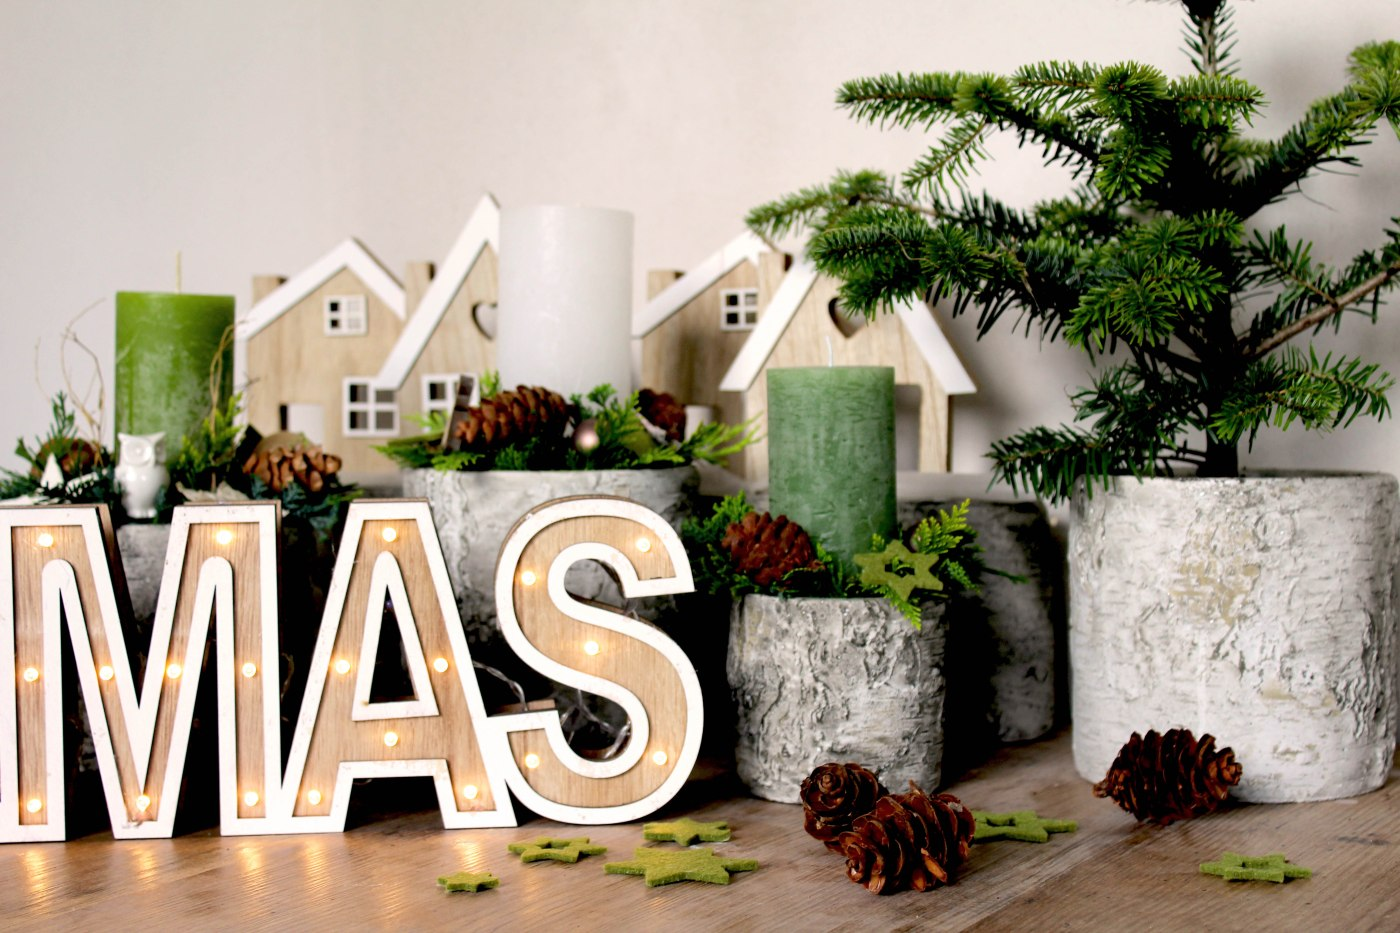 Weihnachtsausstellung-17-Winkenbach